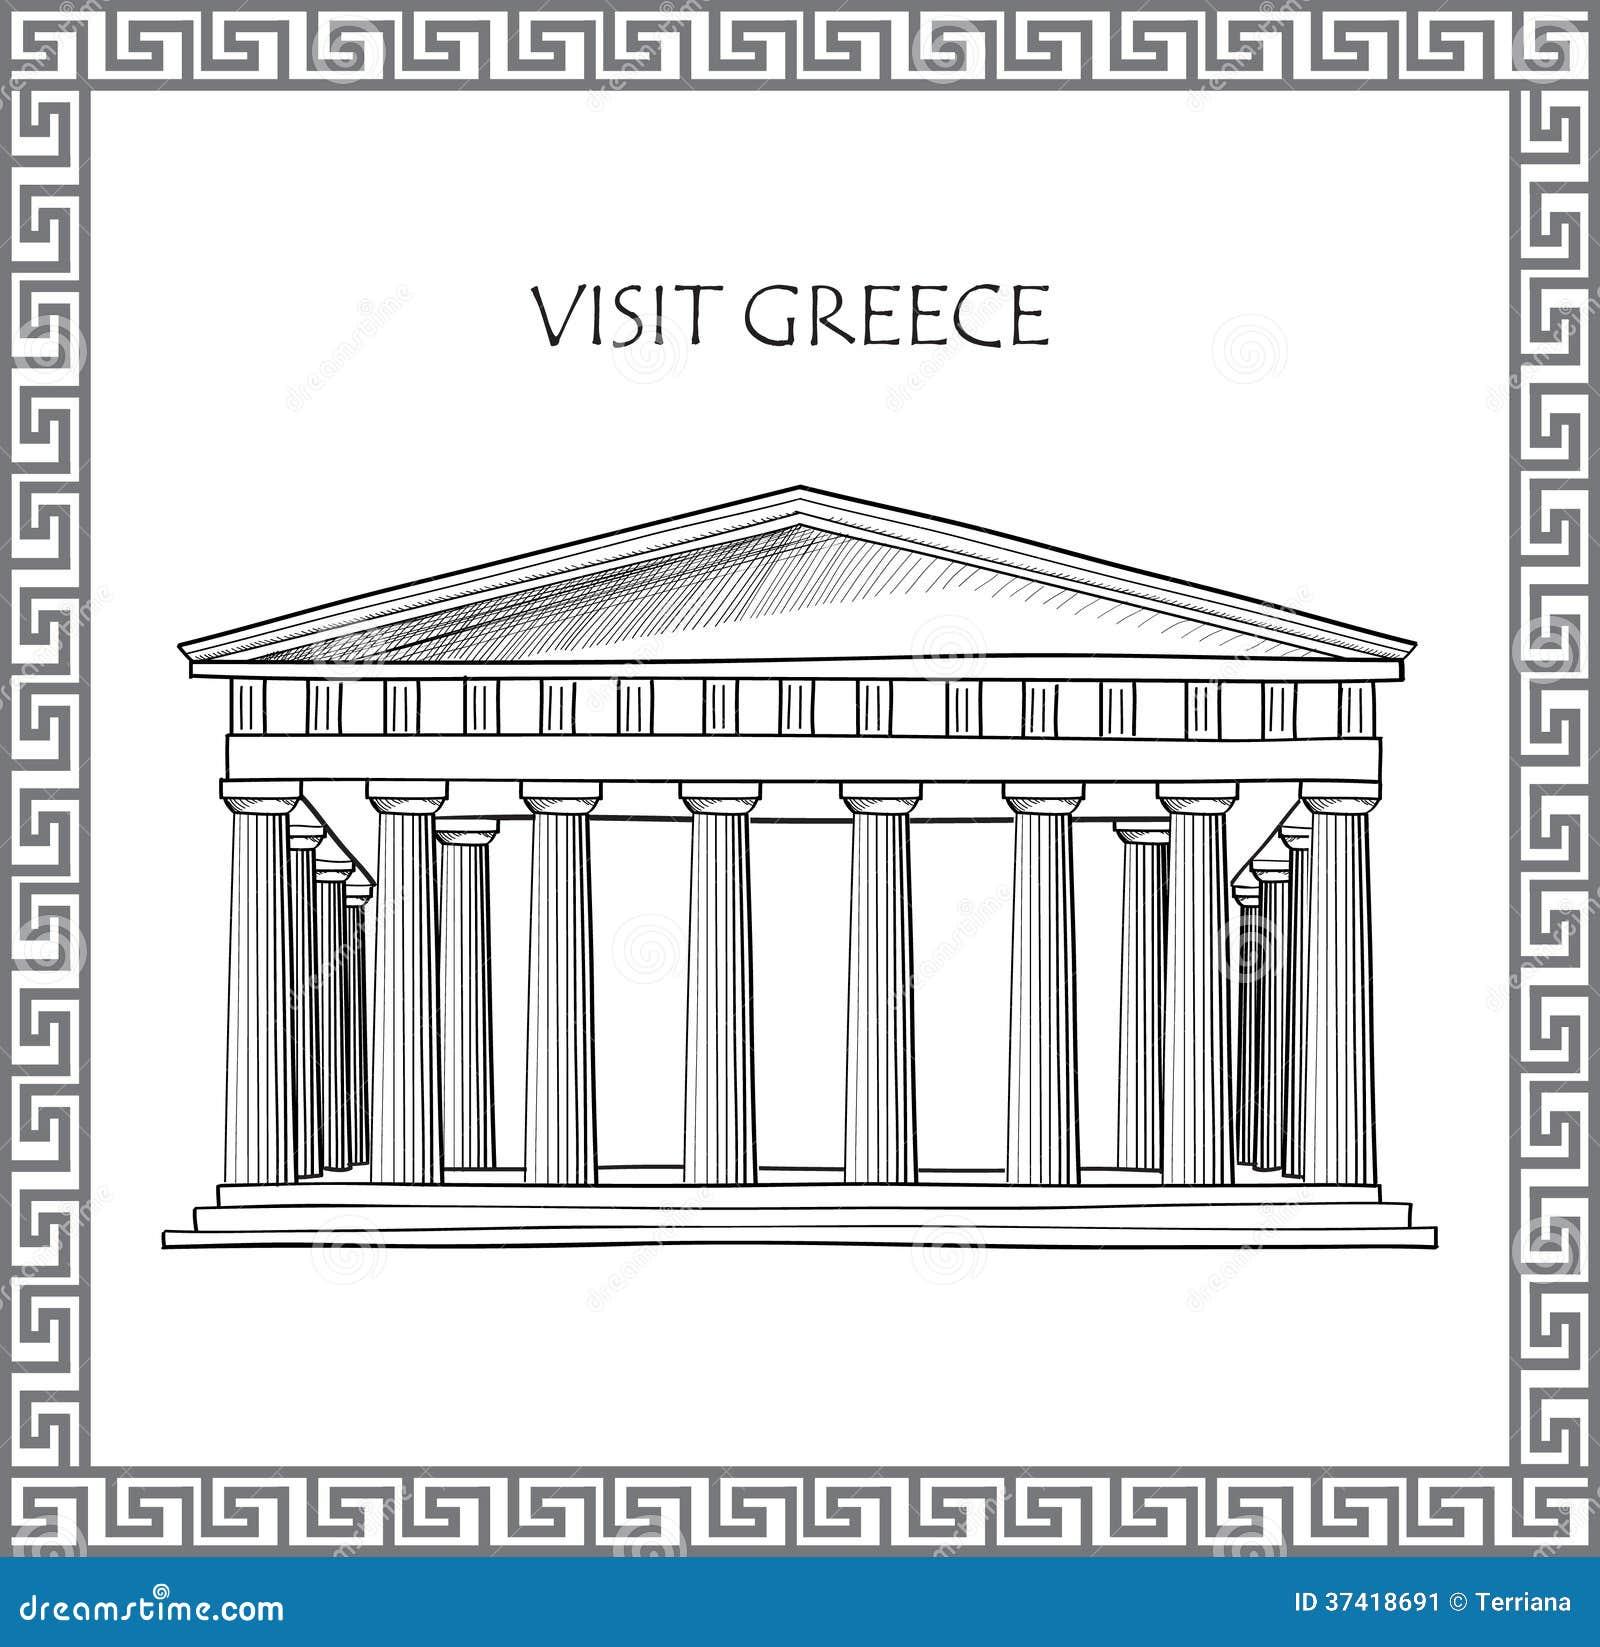 ... Sketches Acropolis in athens, greece. sketch of historic building